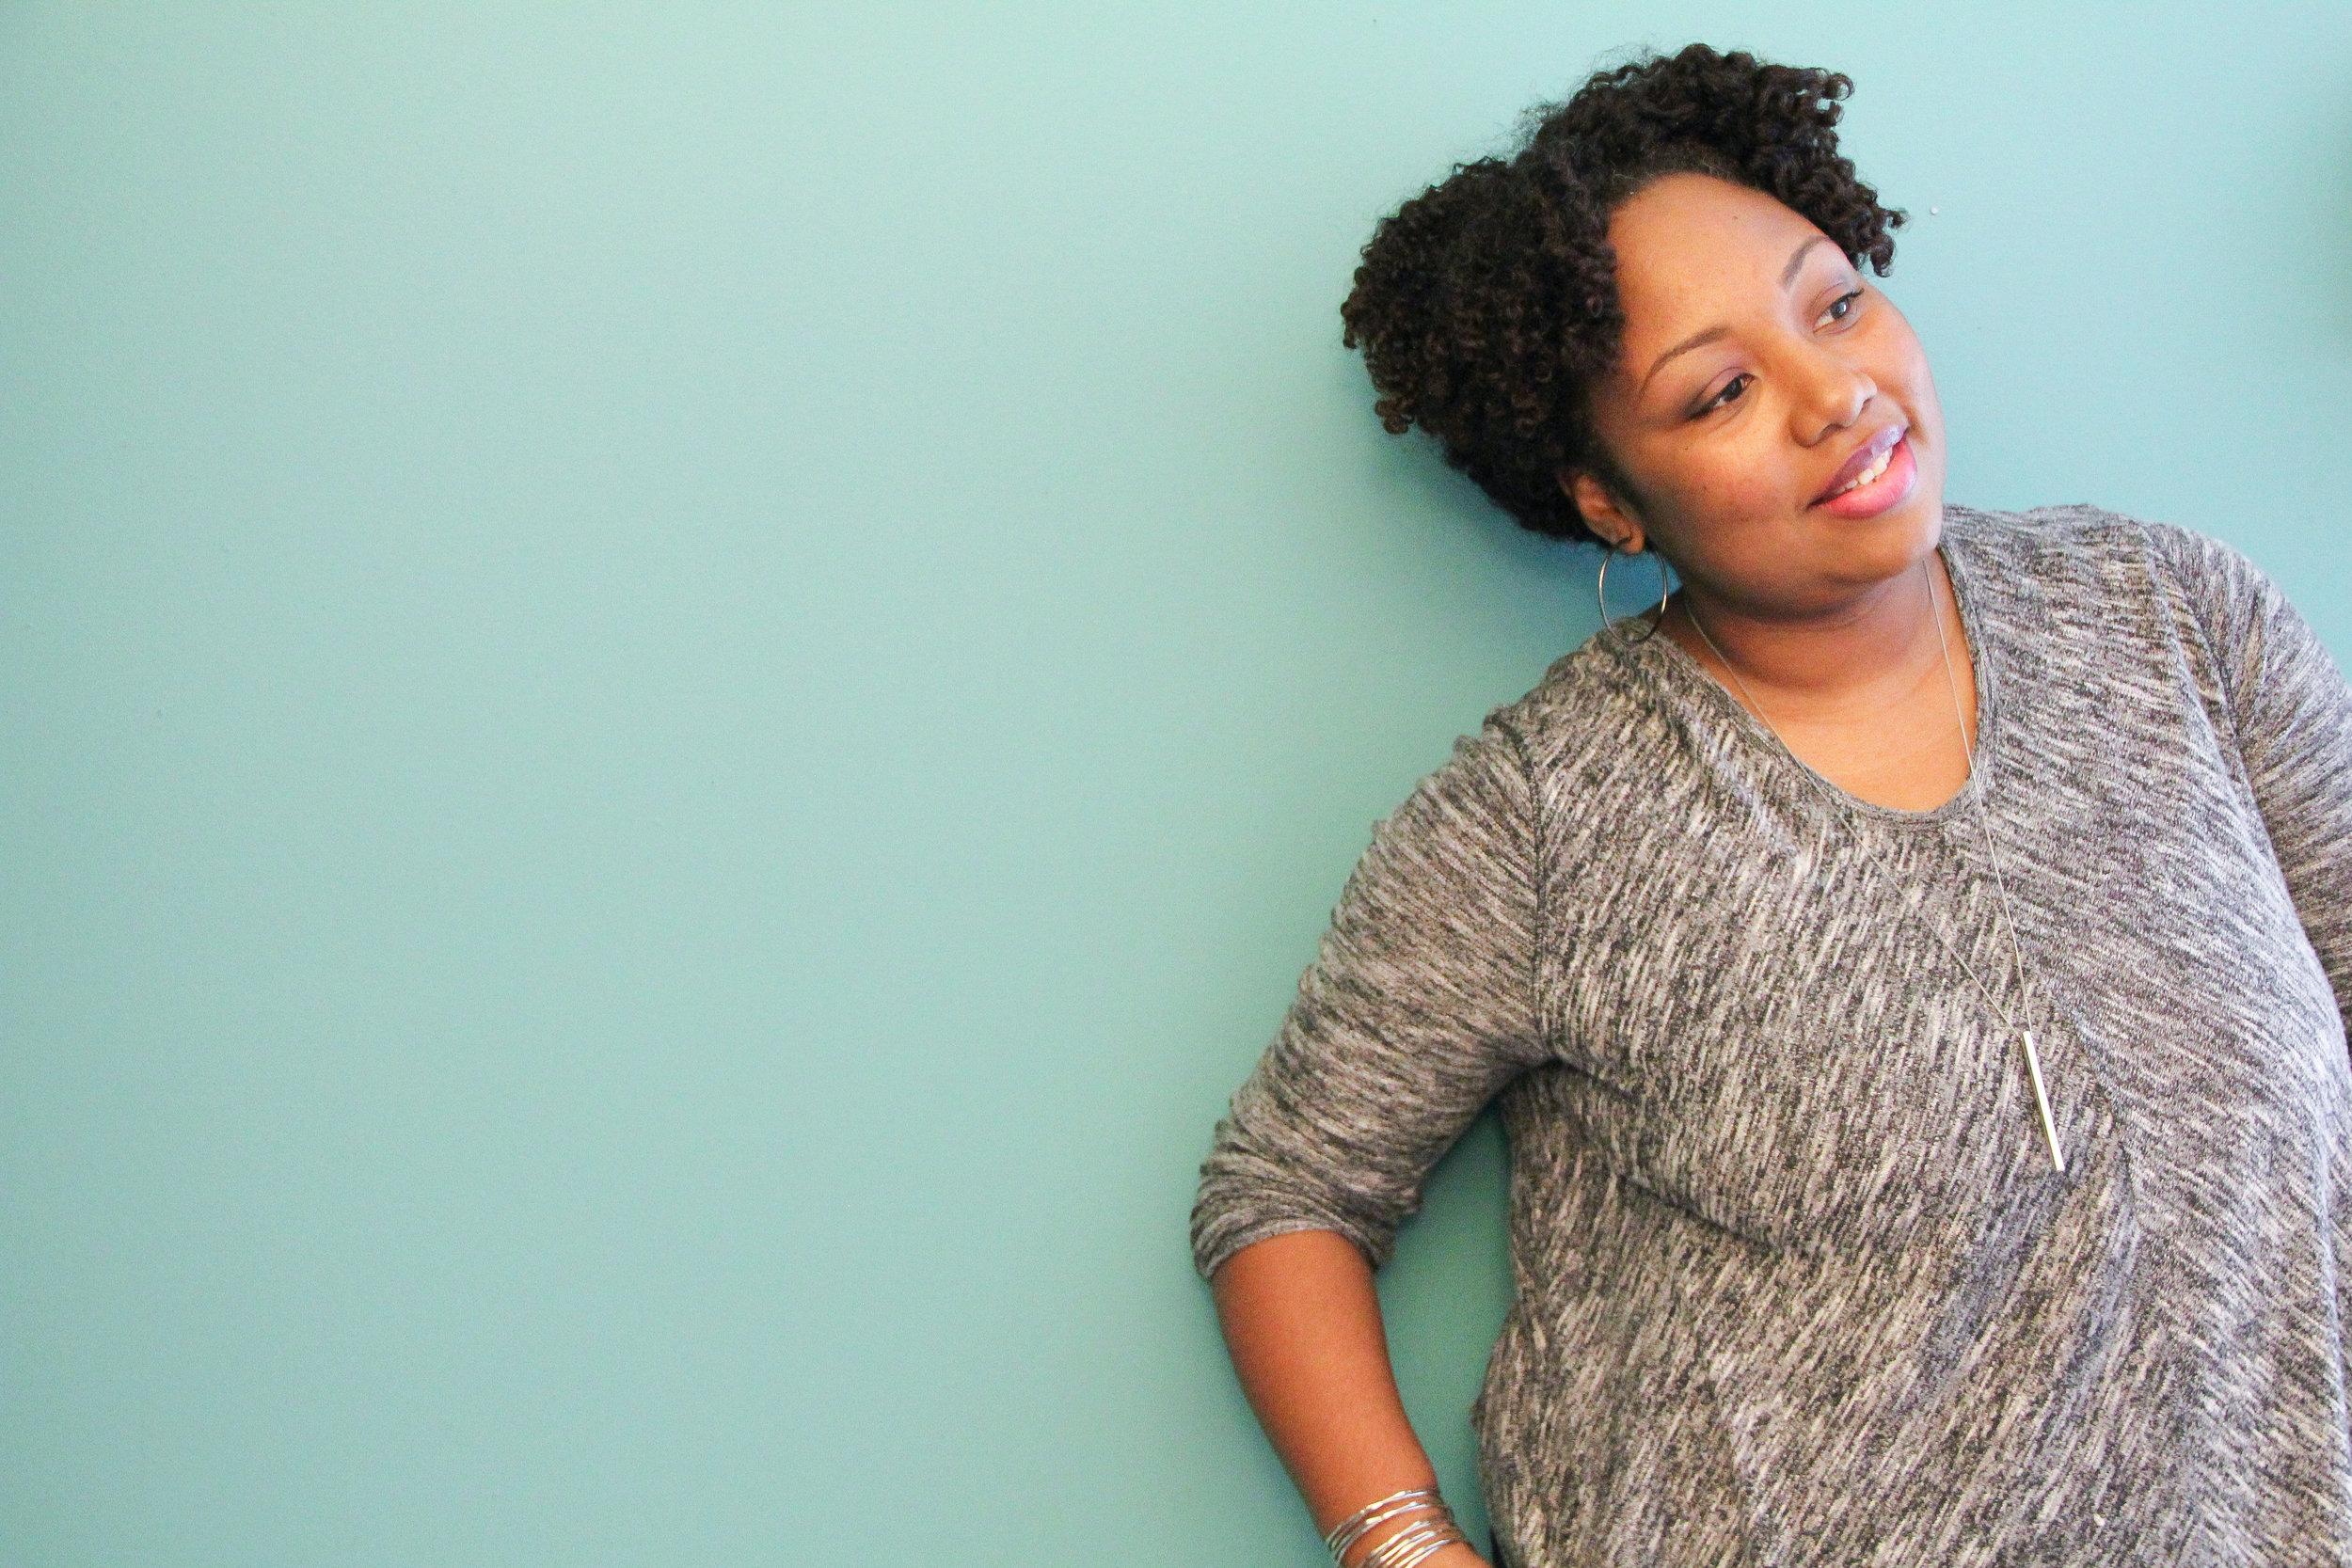 the-real-female-entrepreneur-interview-with-chamel-evans-stories-of-female-entrepreneurs